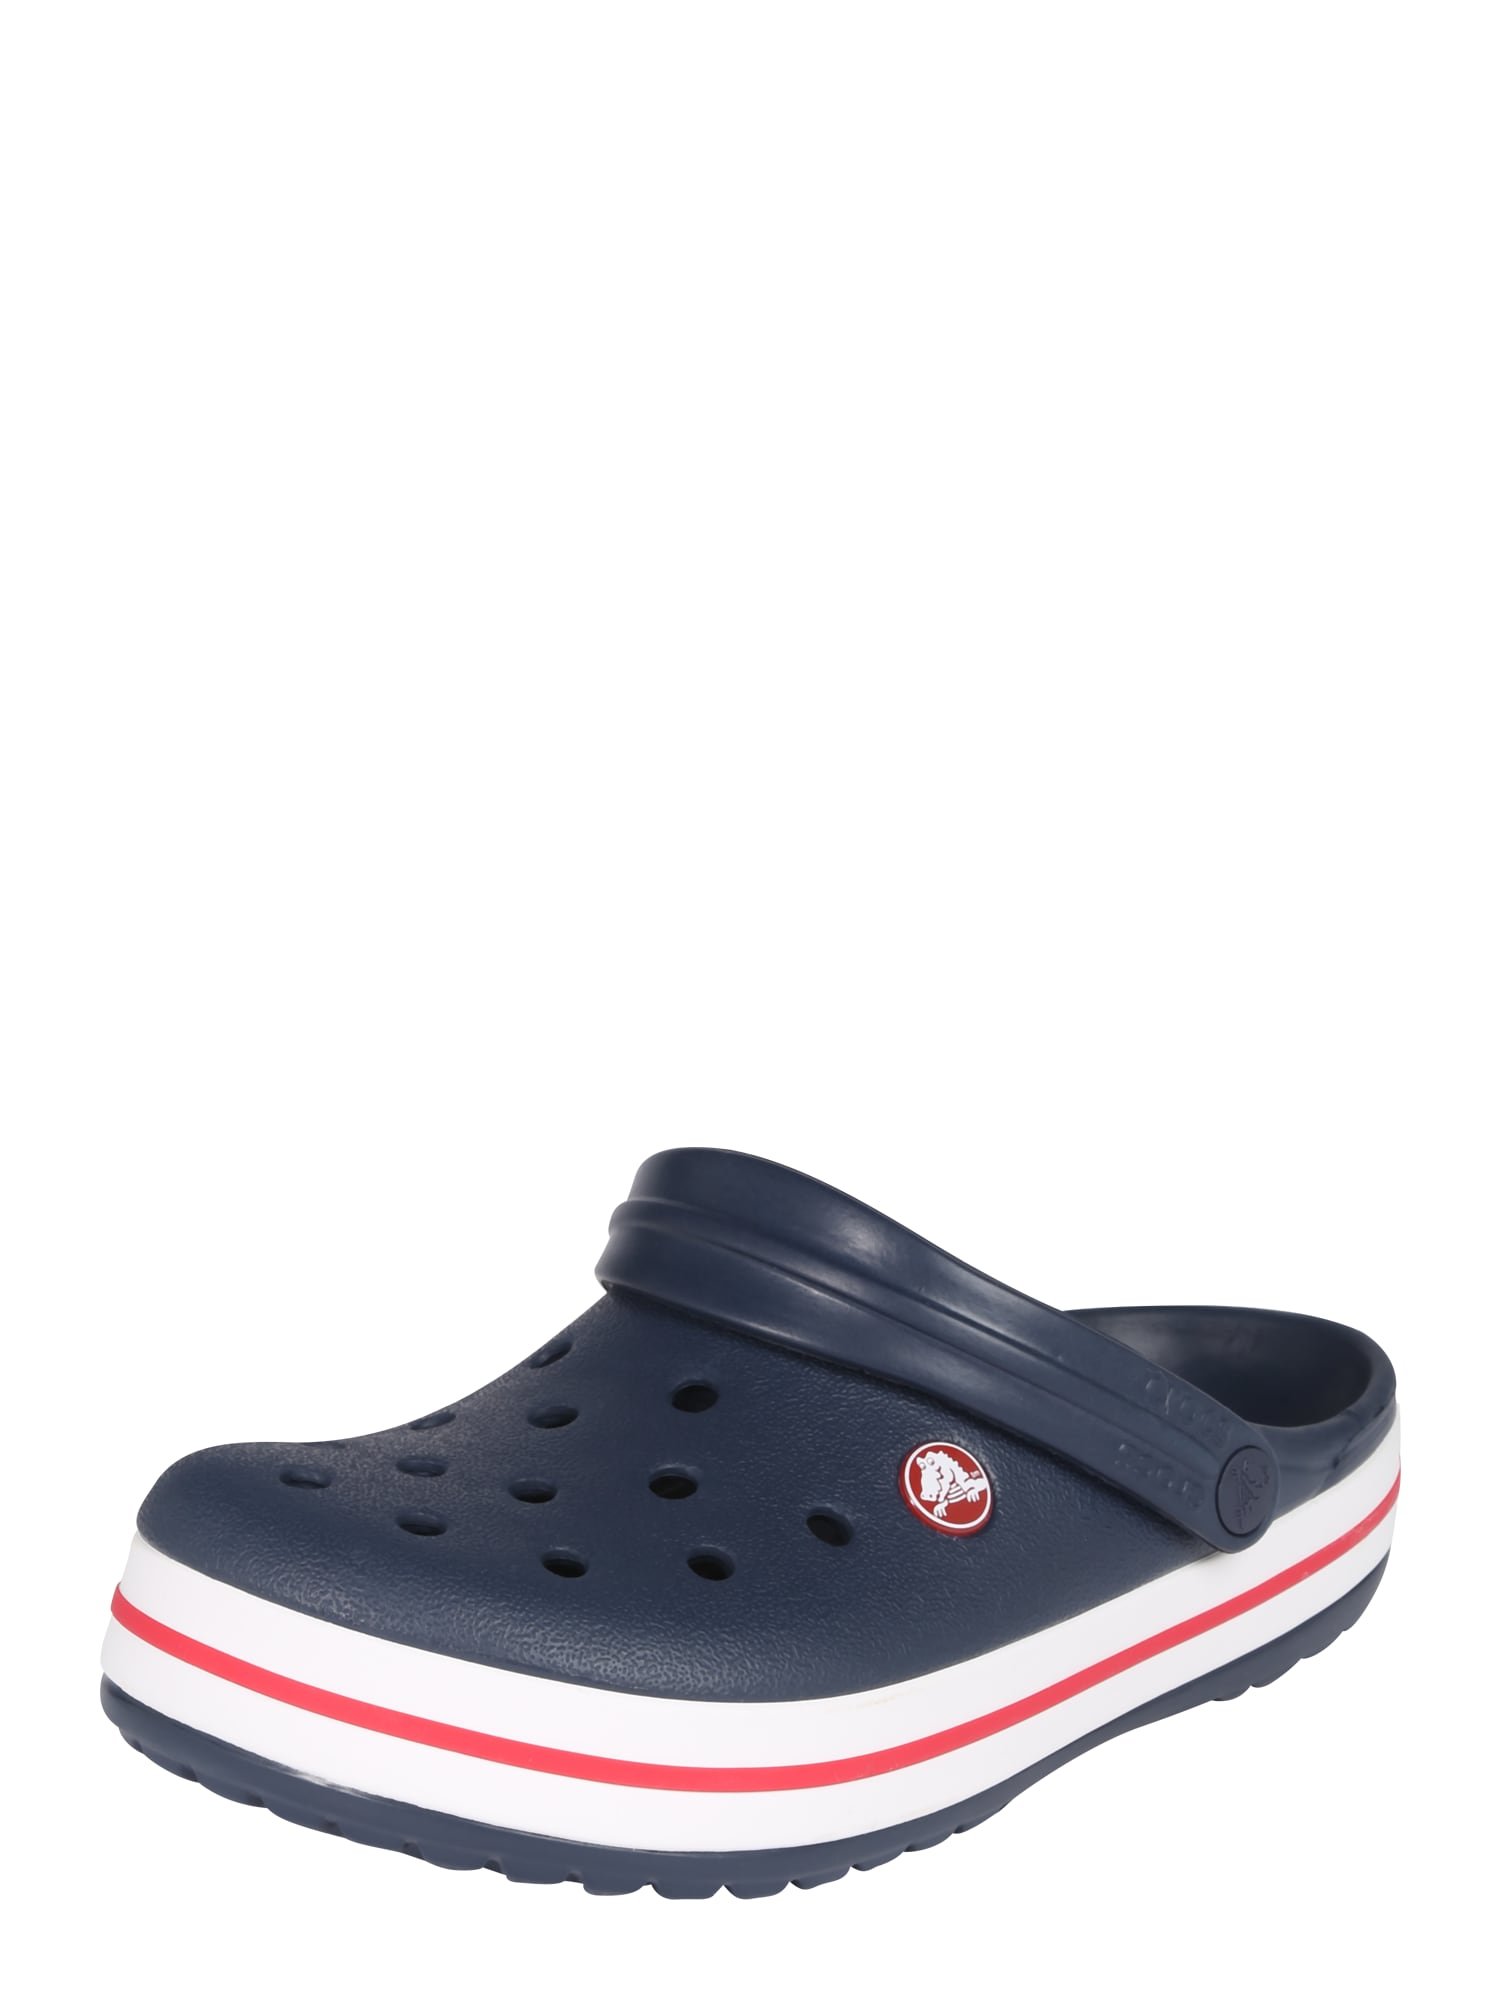 Pantofle Crocband námořnická modř Crocs